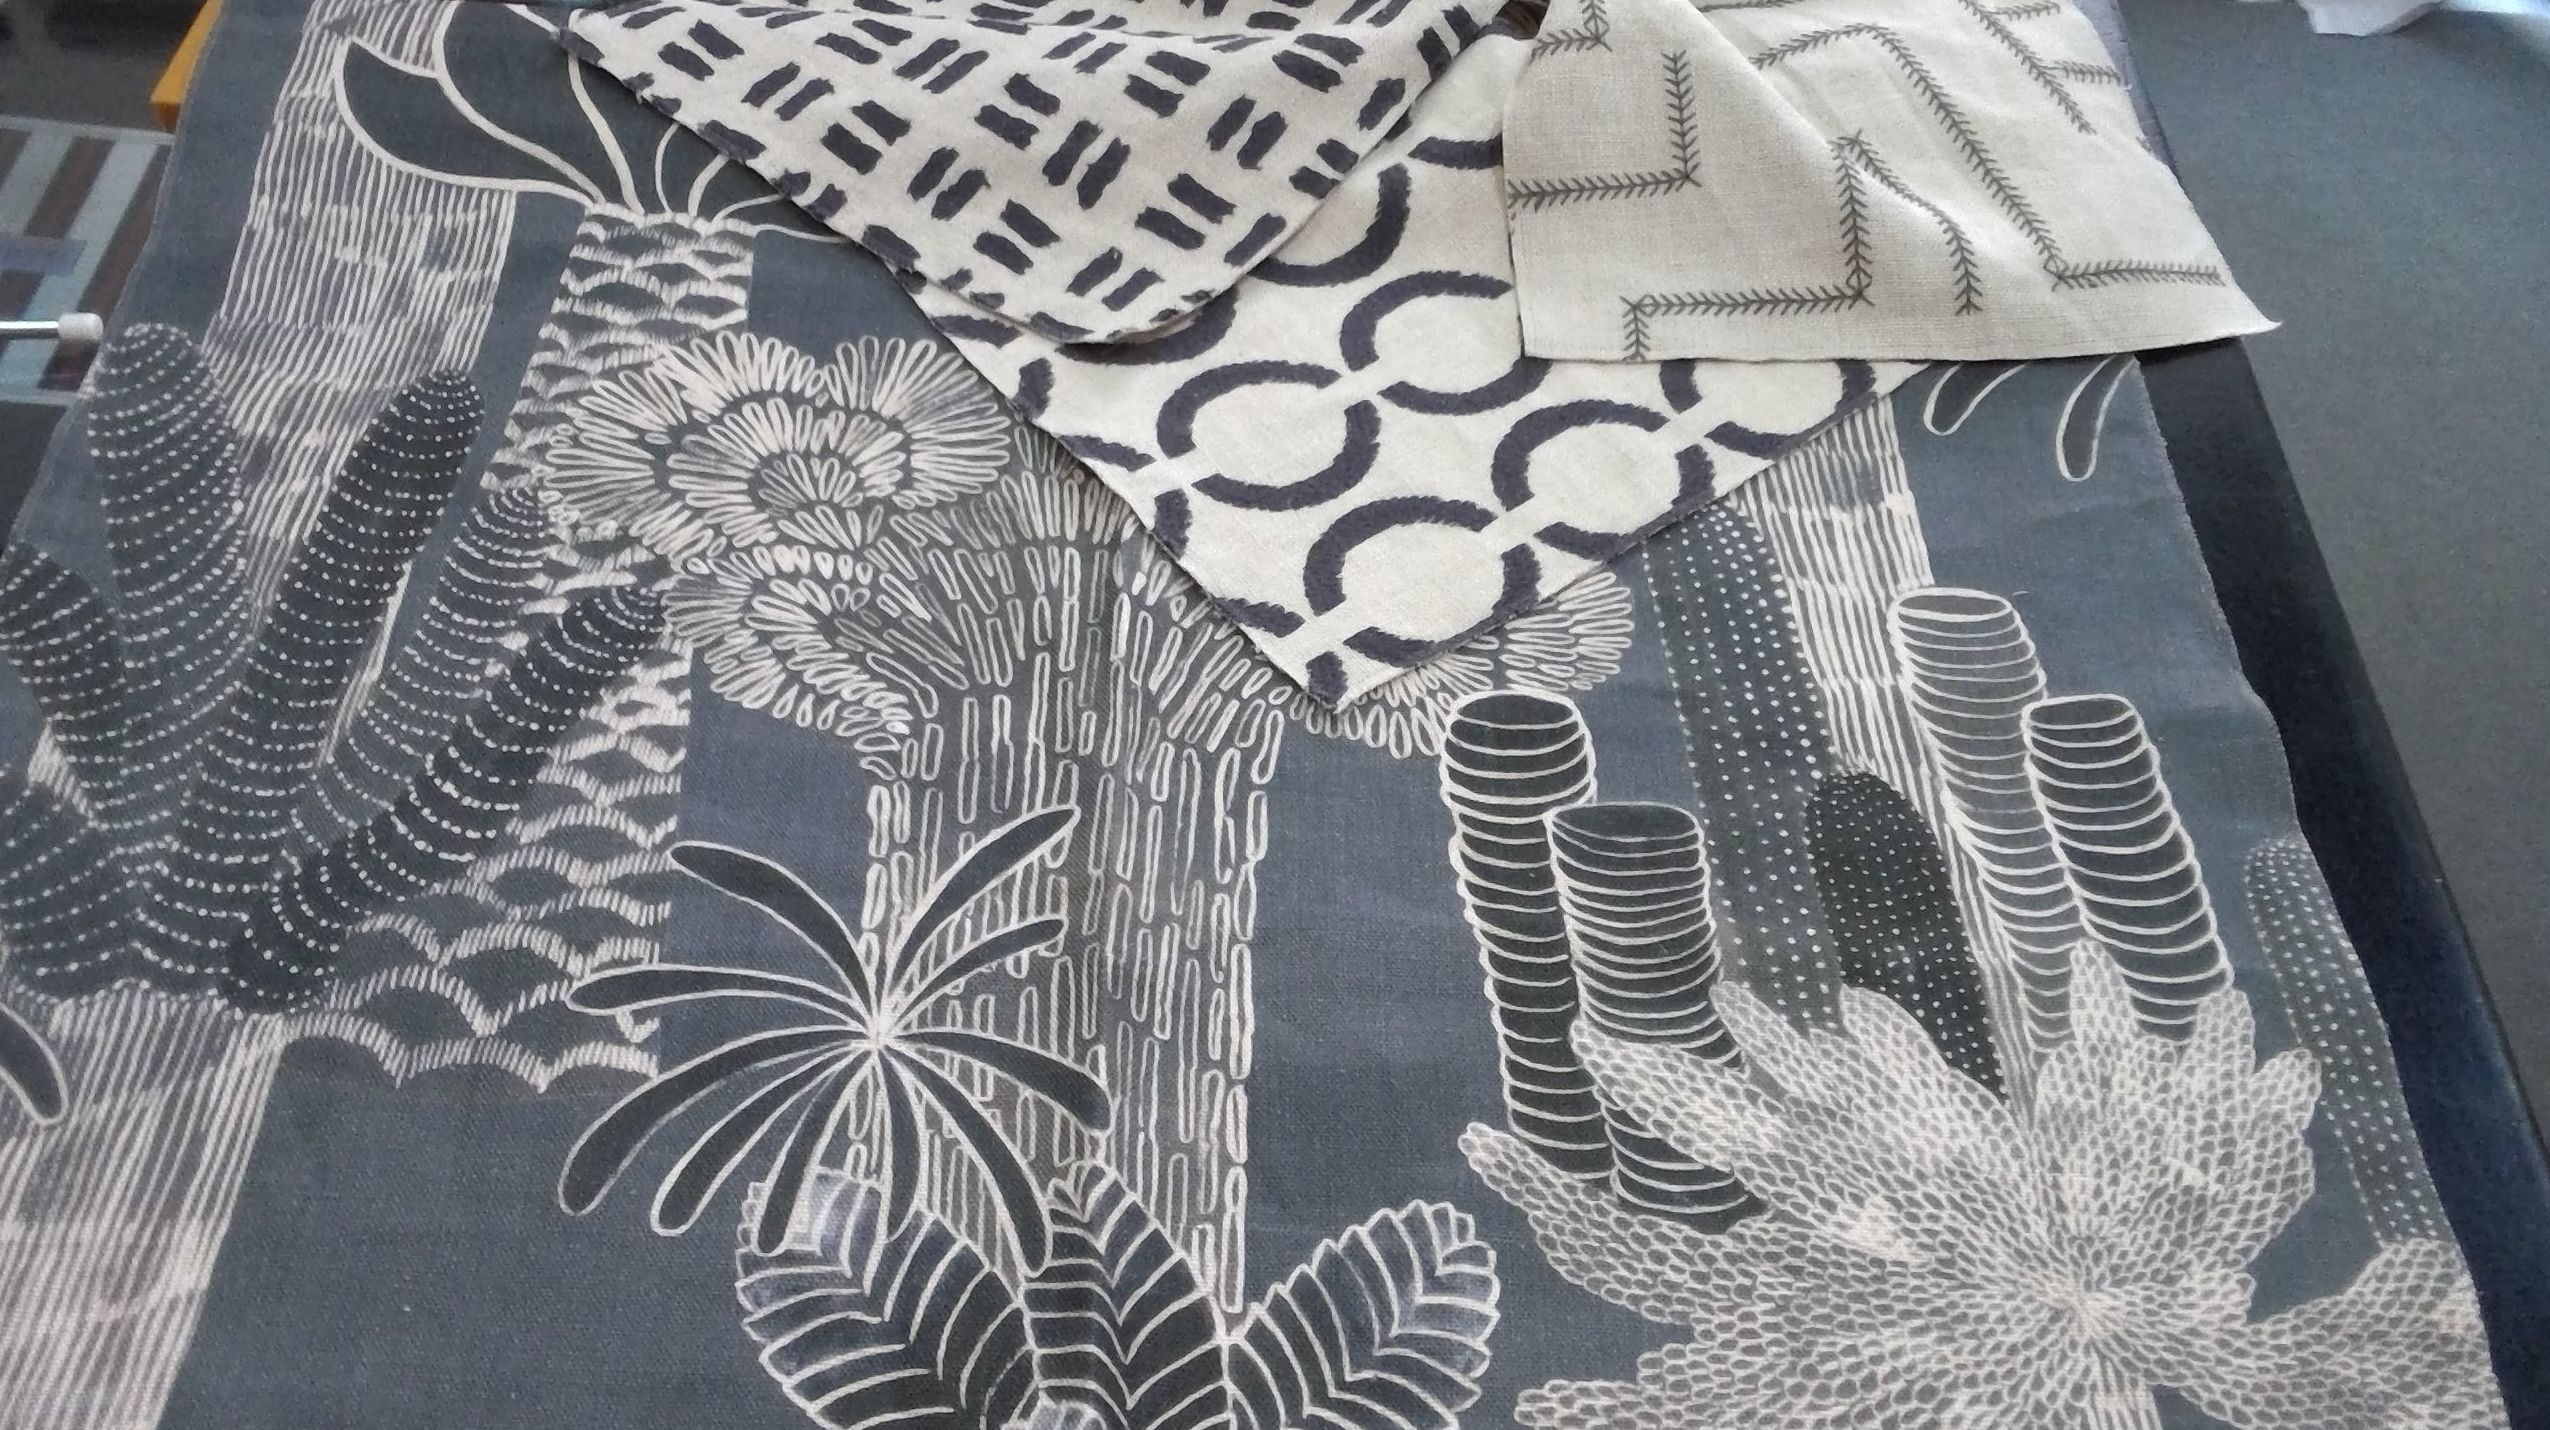 Foto 5 de Decoración textil en Madrid | Diseño Textil